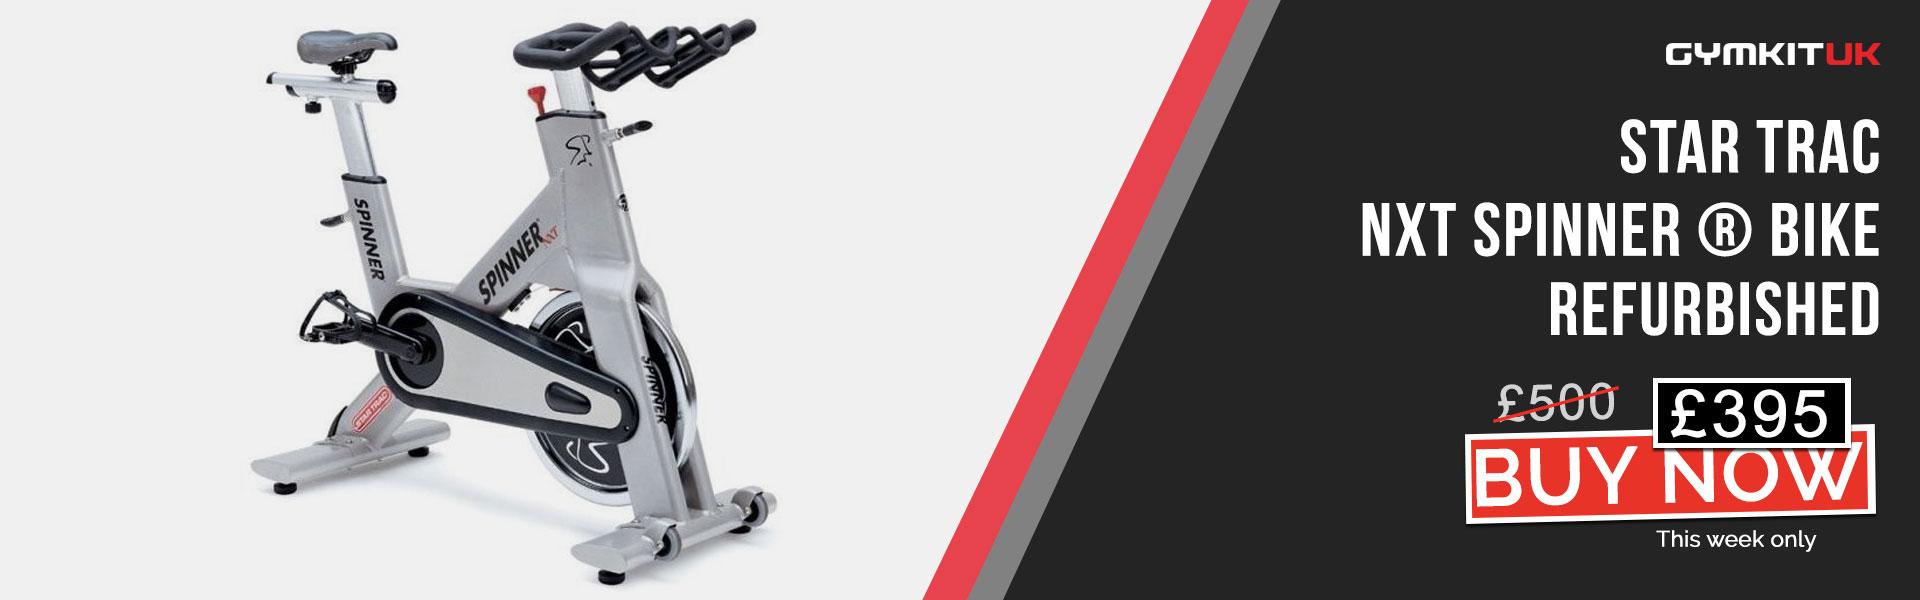 Star Trac NXT Spinner ® Bike